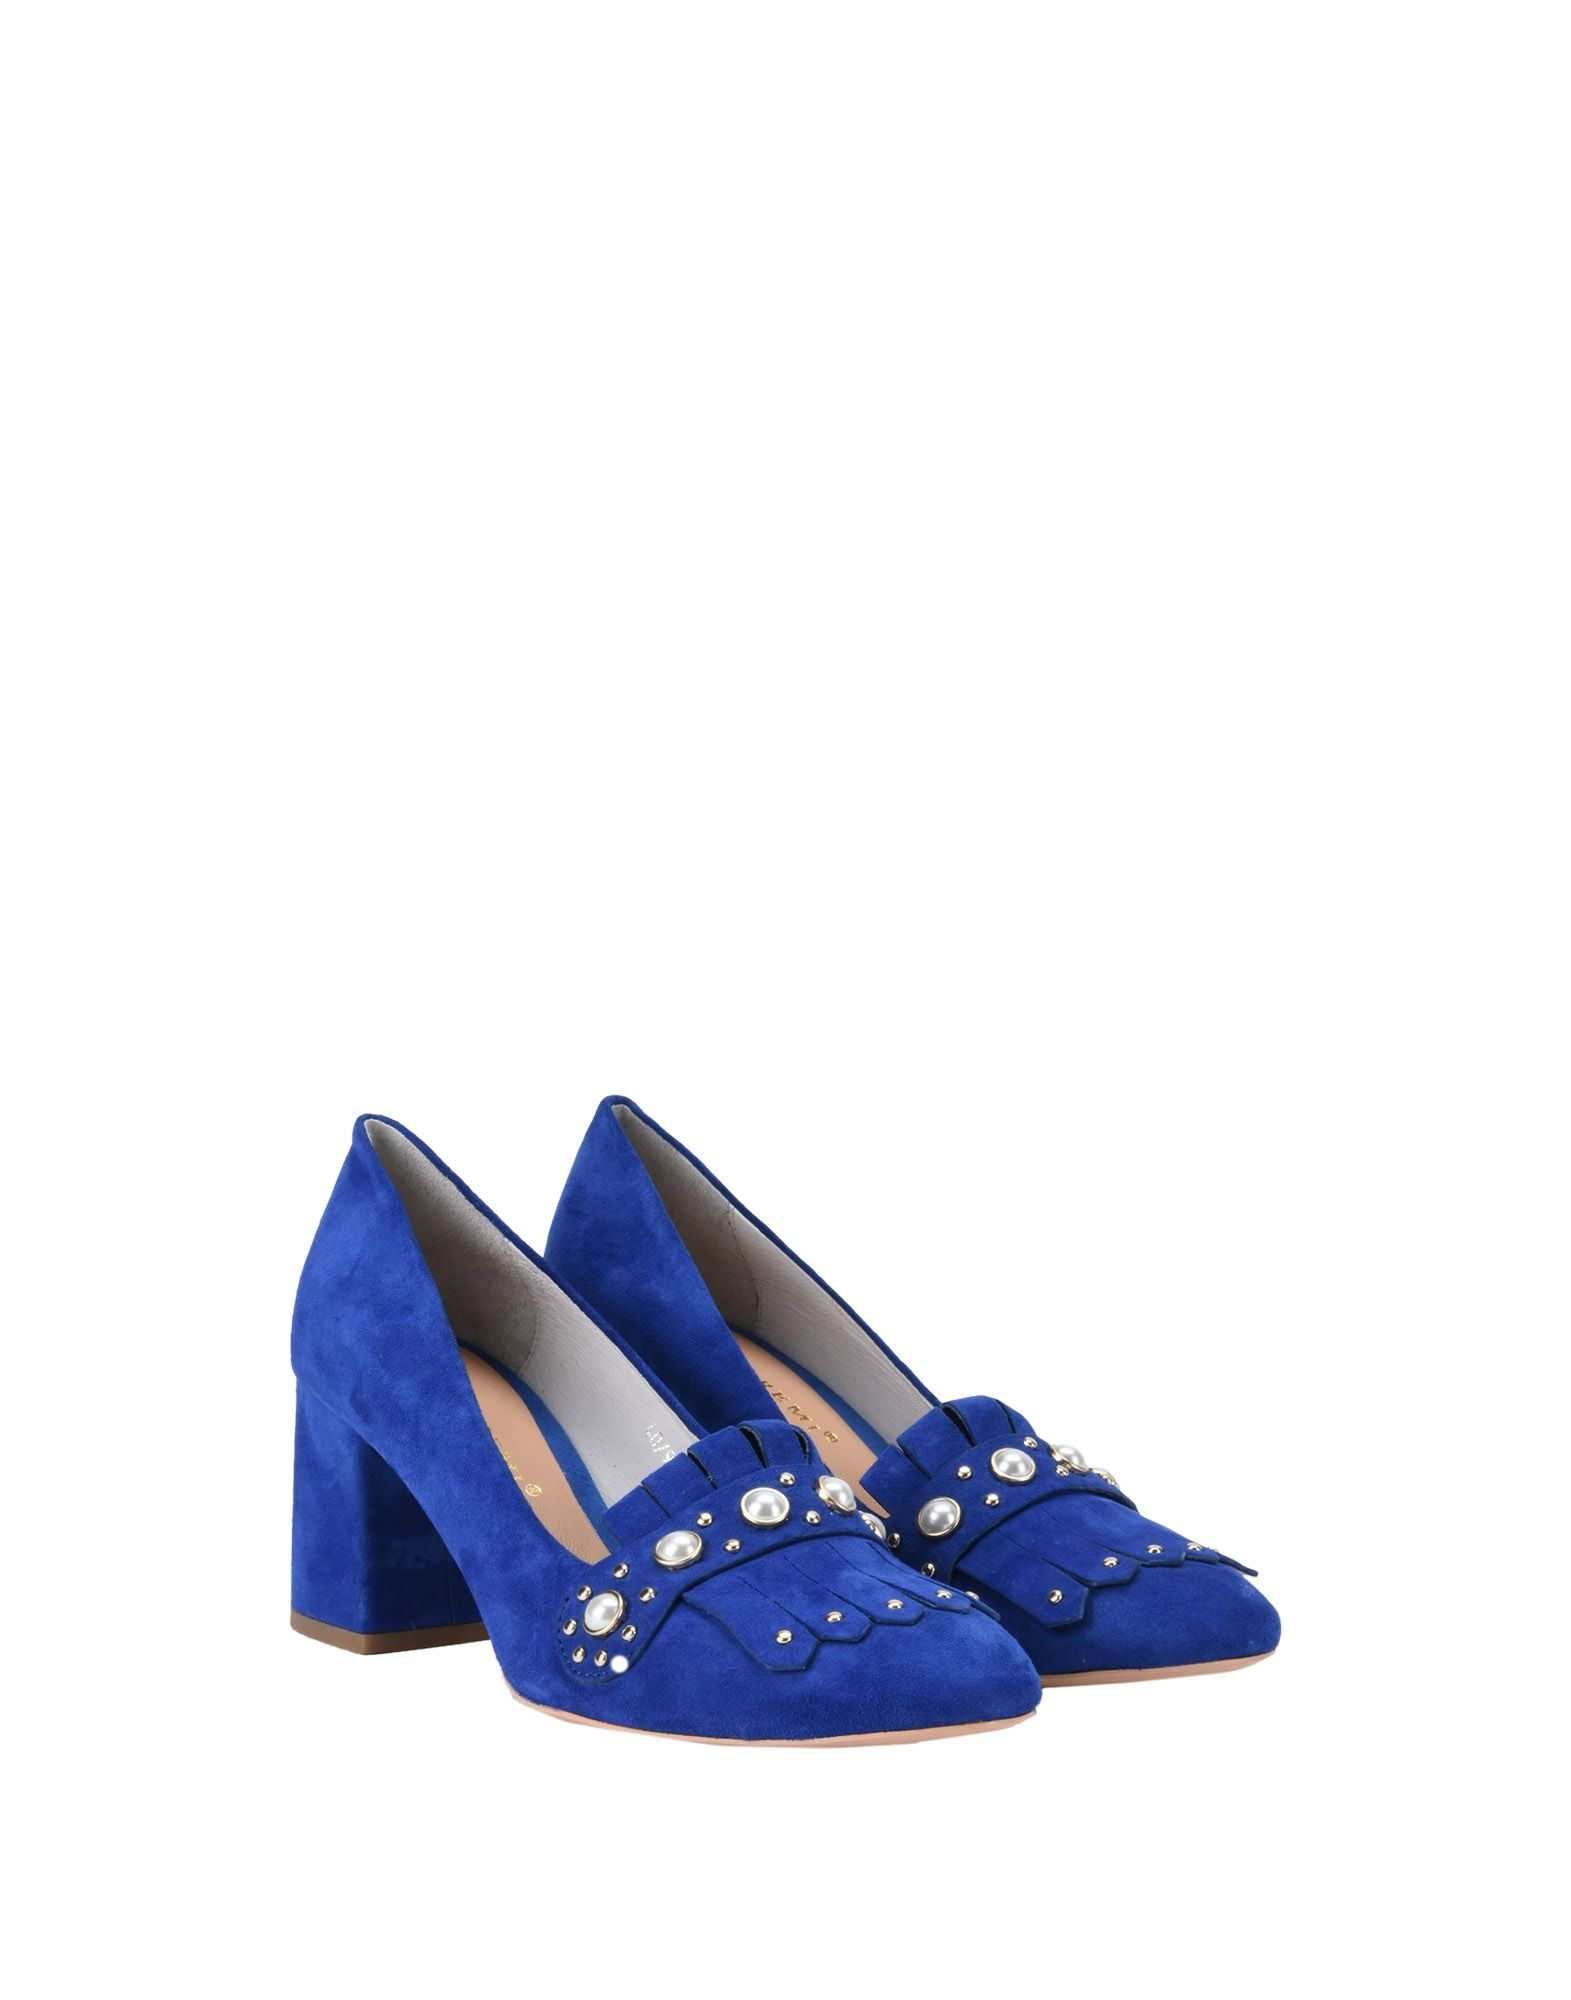 Bruno Premi Mokassins Damen 11443727TG  11443727TG Damen Gute Qualität beliebte Schuhe 870c3b